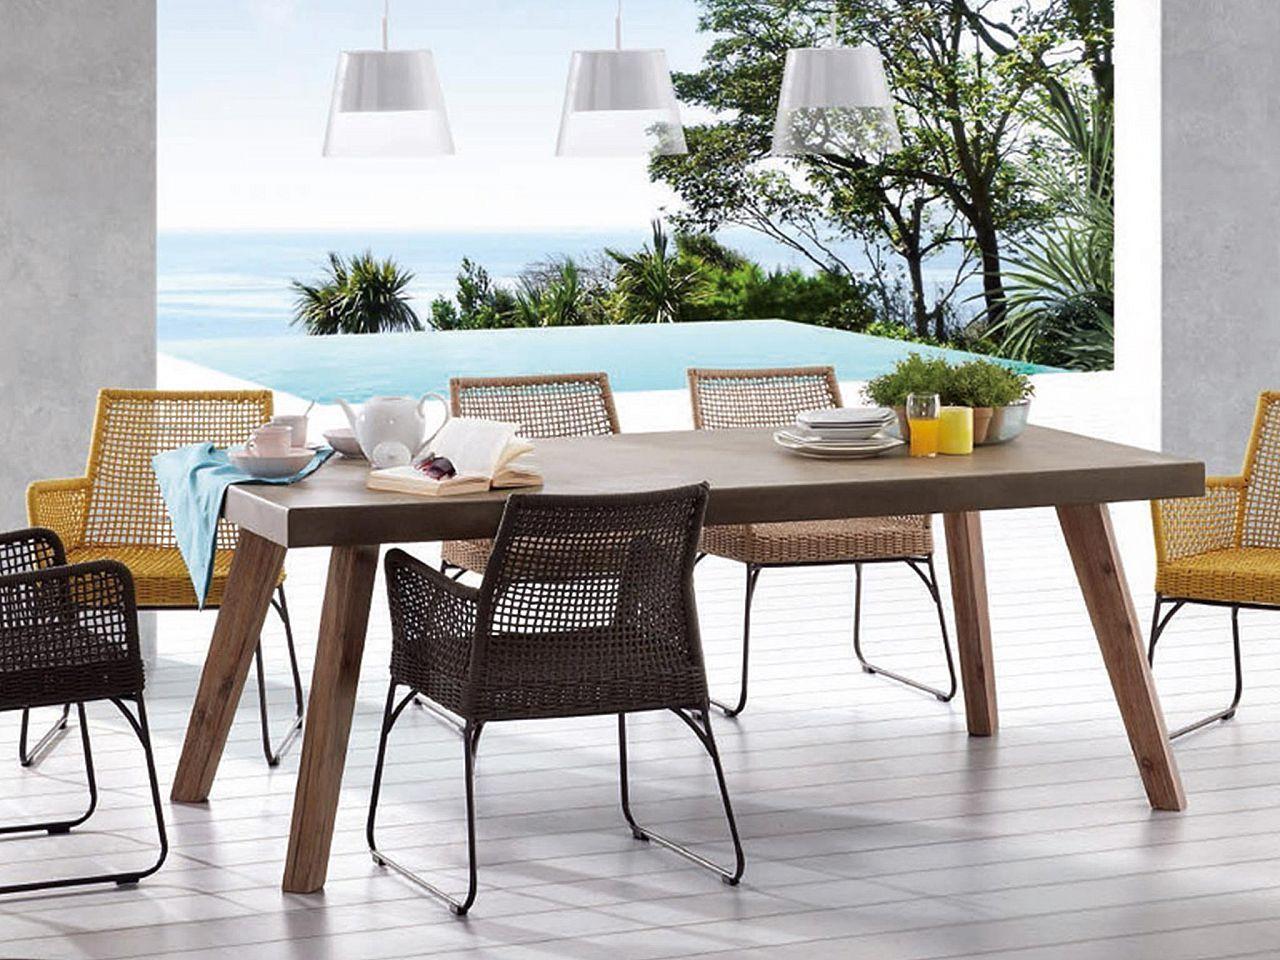 Aldo tavolo 200x100 legno acacia   Tavolo esterno, Tavolo ...